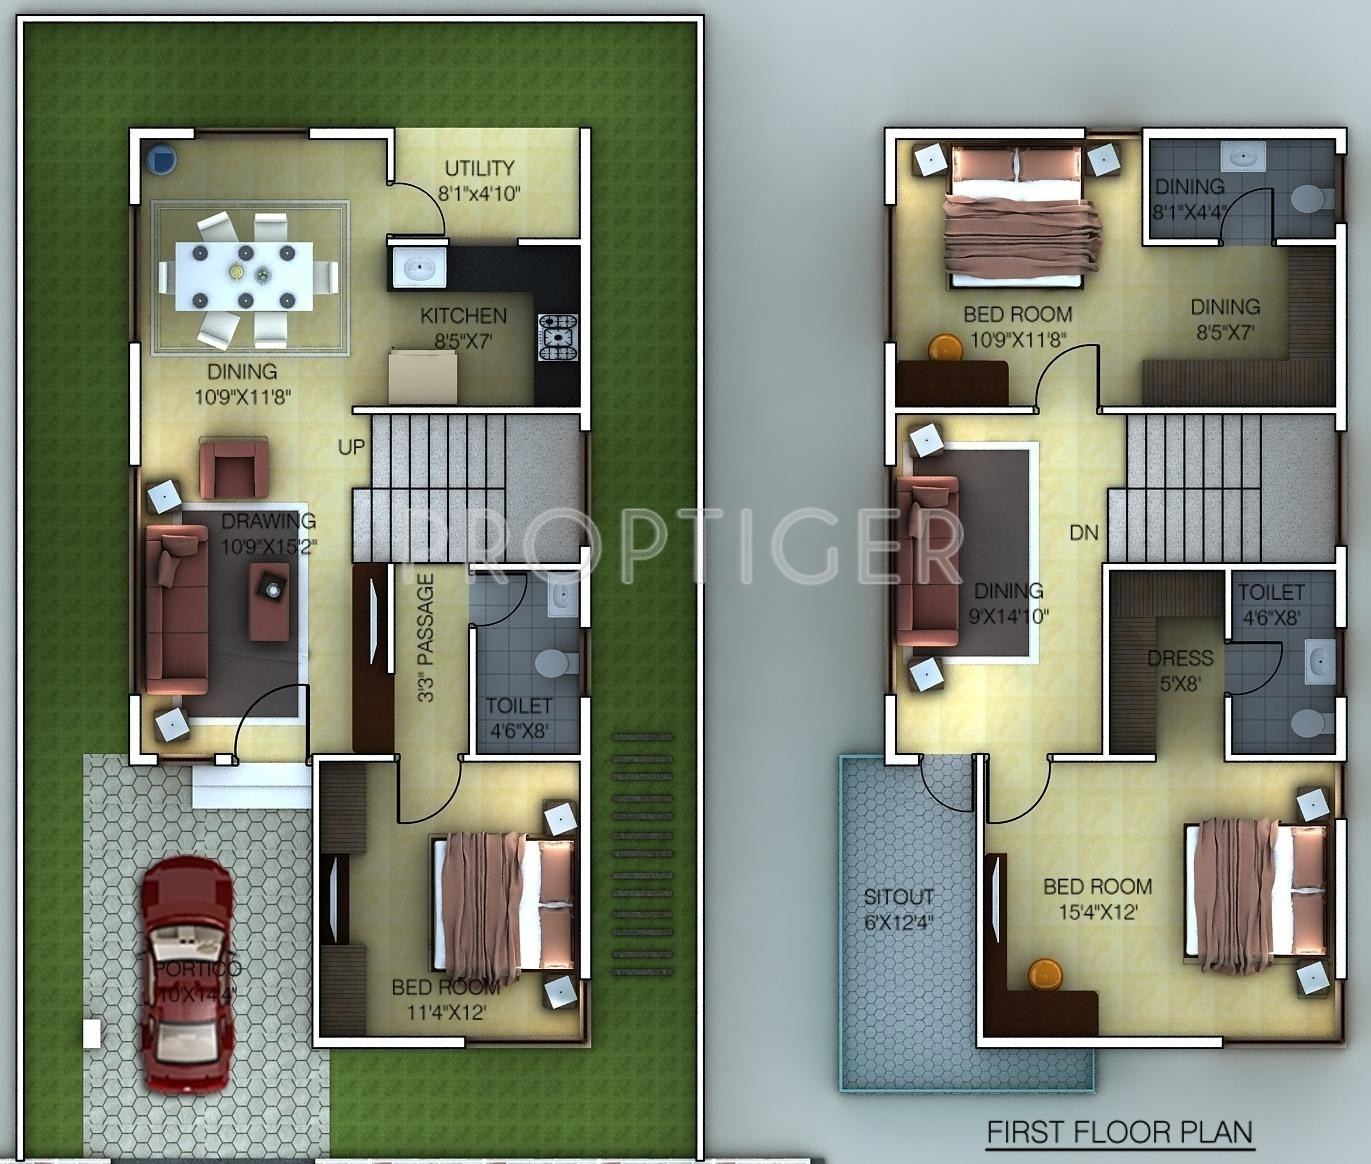 Golden homes house plans - House plans